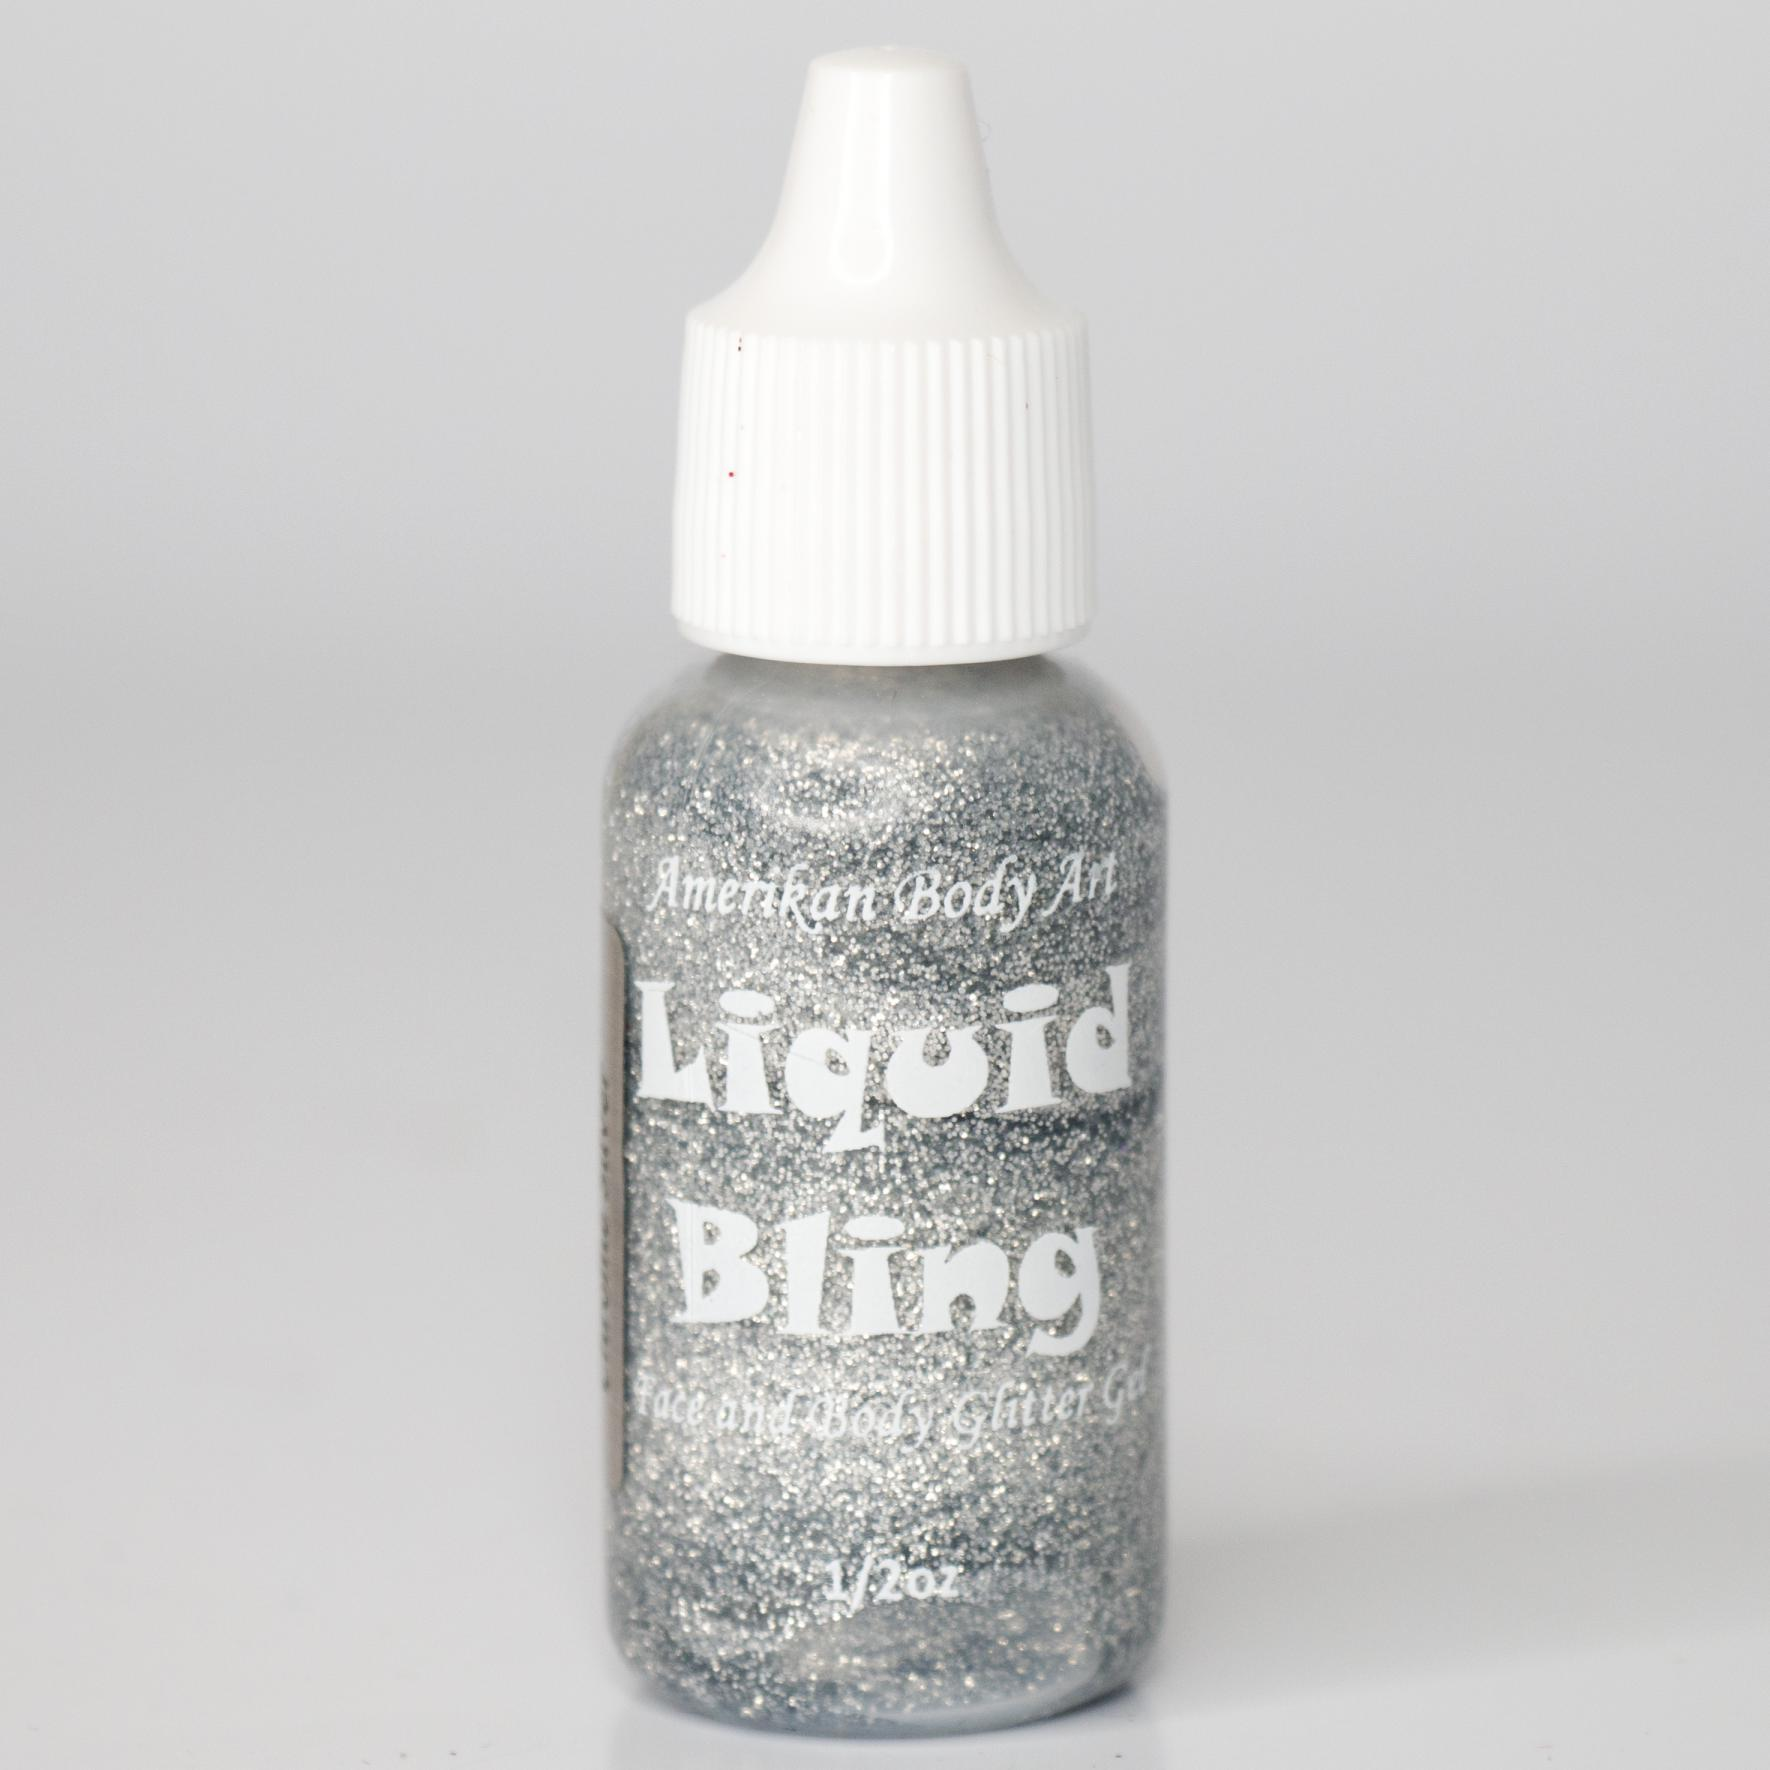 Biodegradable Silver Liquid Bling (Ocean-Safe)